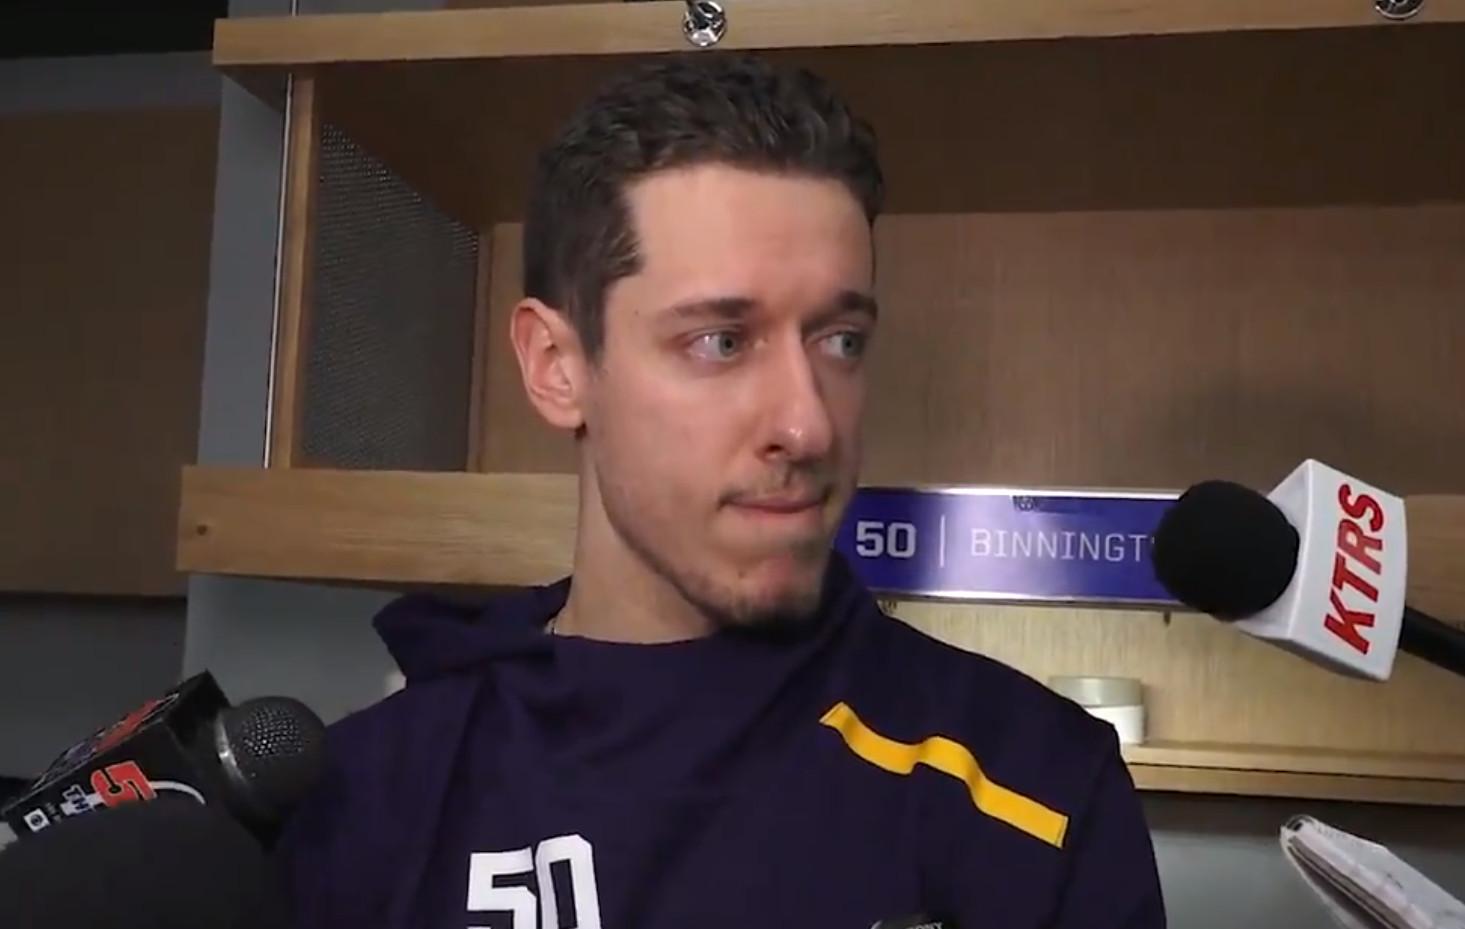 Video: Jordan Binnington has a great response when asked if he's nervous